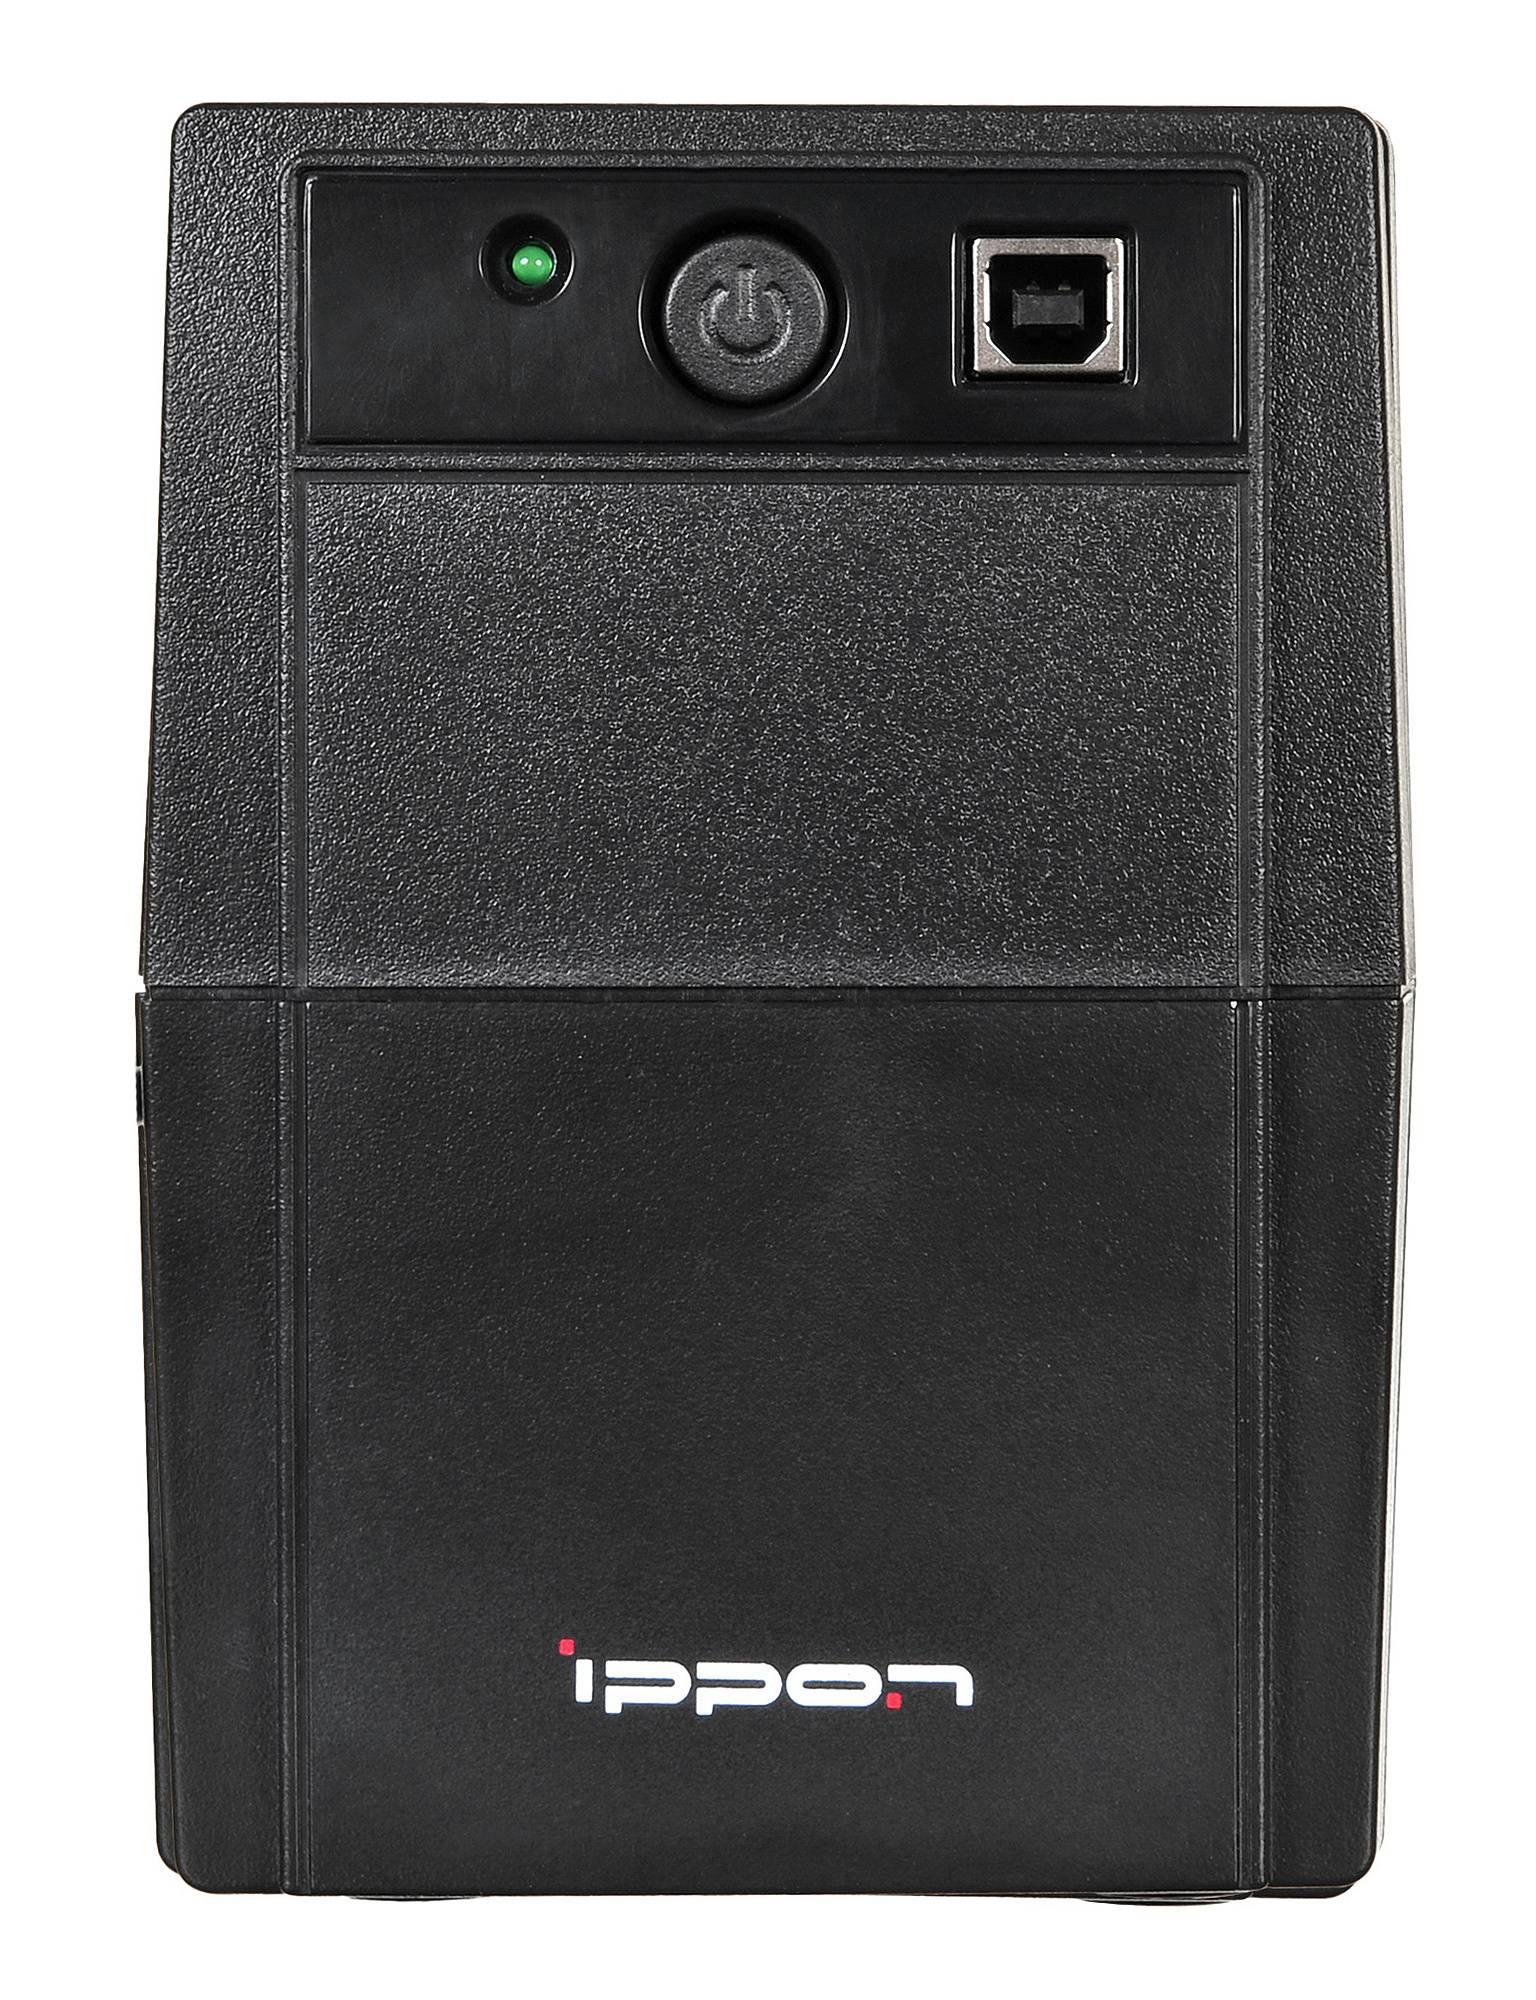 ИБП Ippon Back Basic 1050 Euro черный - фото 1